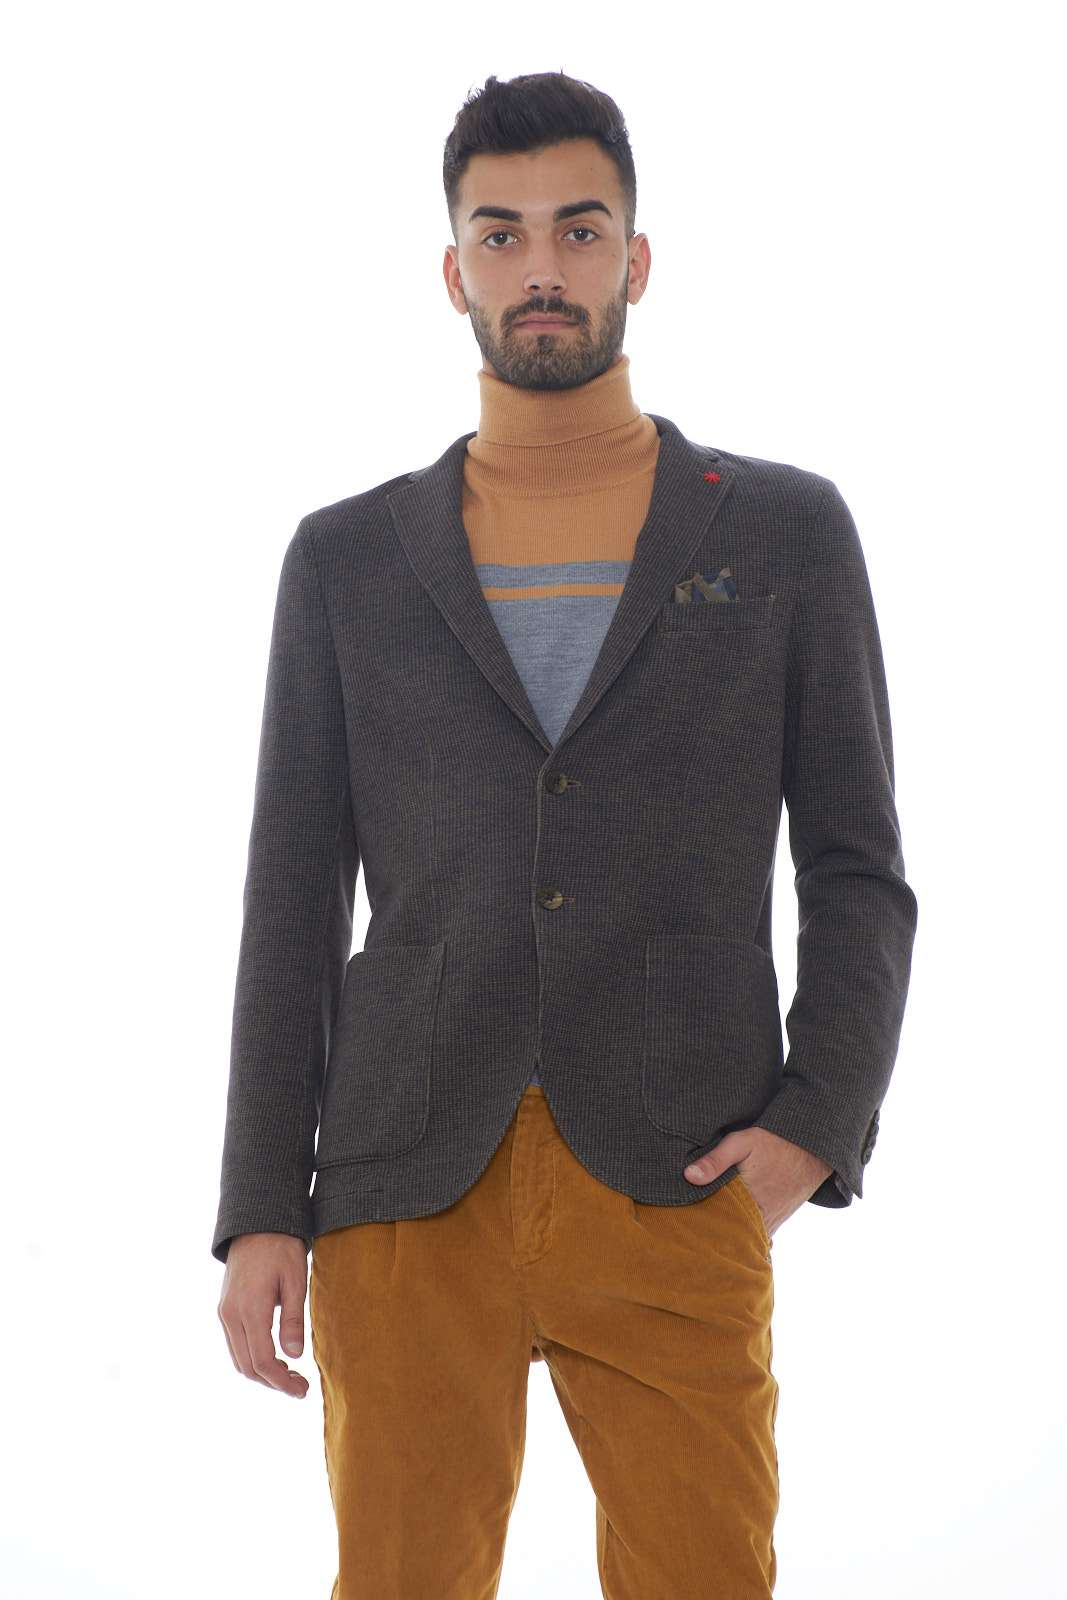 https://www.parmax.com/media/catalog/product/a/i/AI-outlet_parmax-giacca-uomo-Manuel-Ritz-2732G2442T%20193515-A.jpg